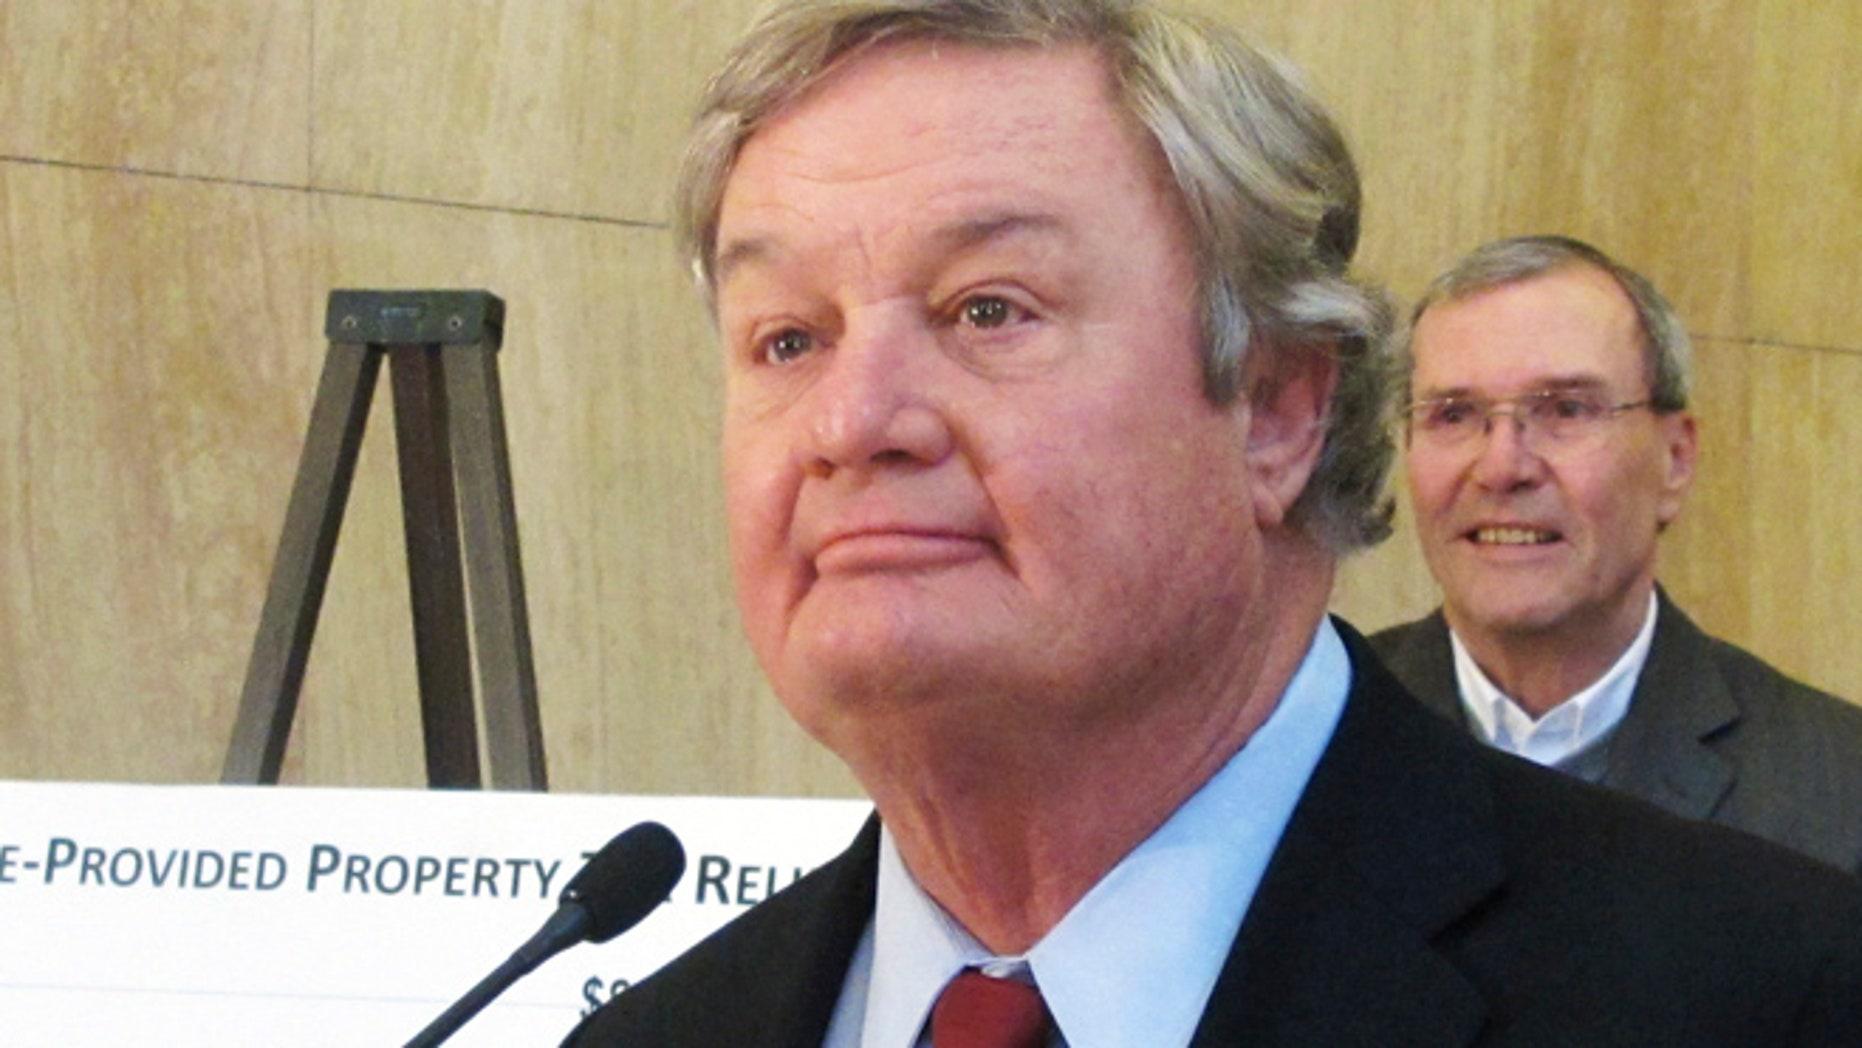 Dec. 3, 2013: North Dakota Gov. Jack Dalrymple speaks at a news conference at the state Capitol in Bismarck. (AP)